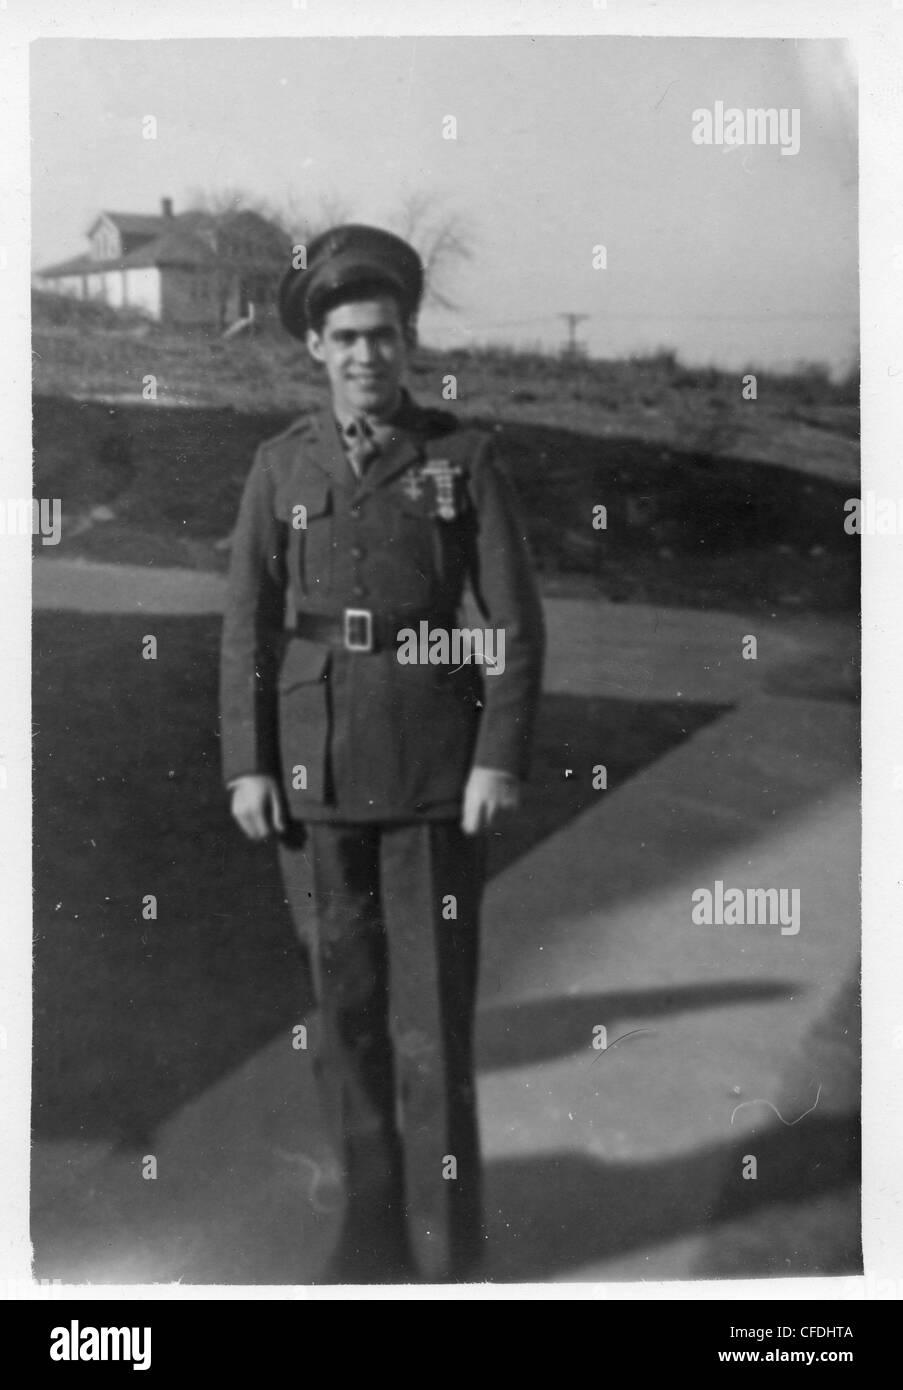 Man in dress uniform 1940s WWII greatest generation USMC - Stock Image